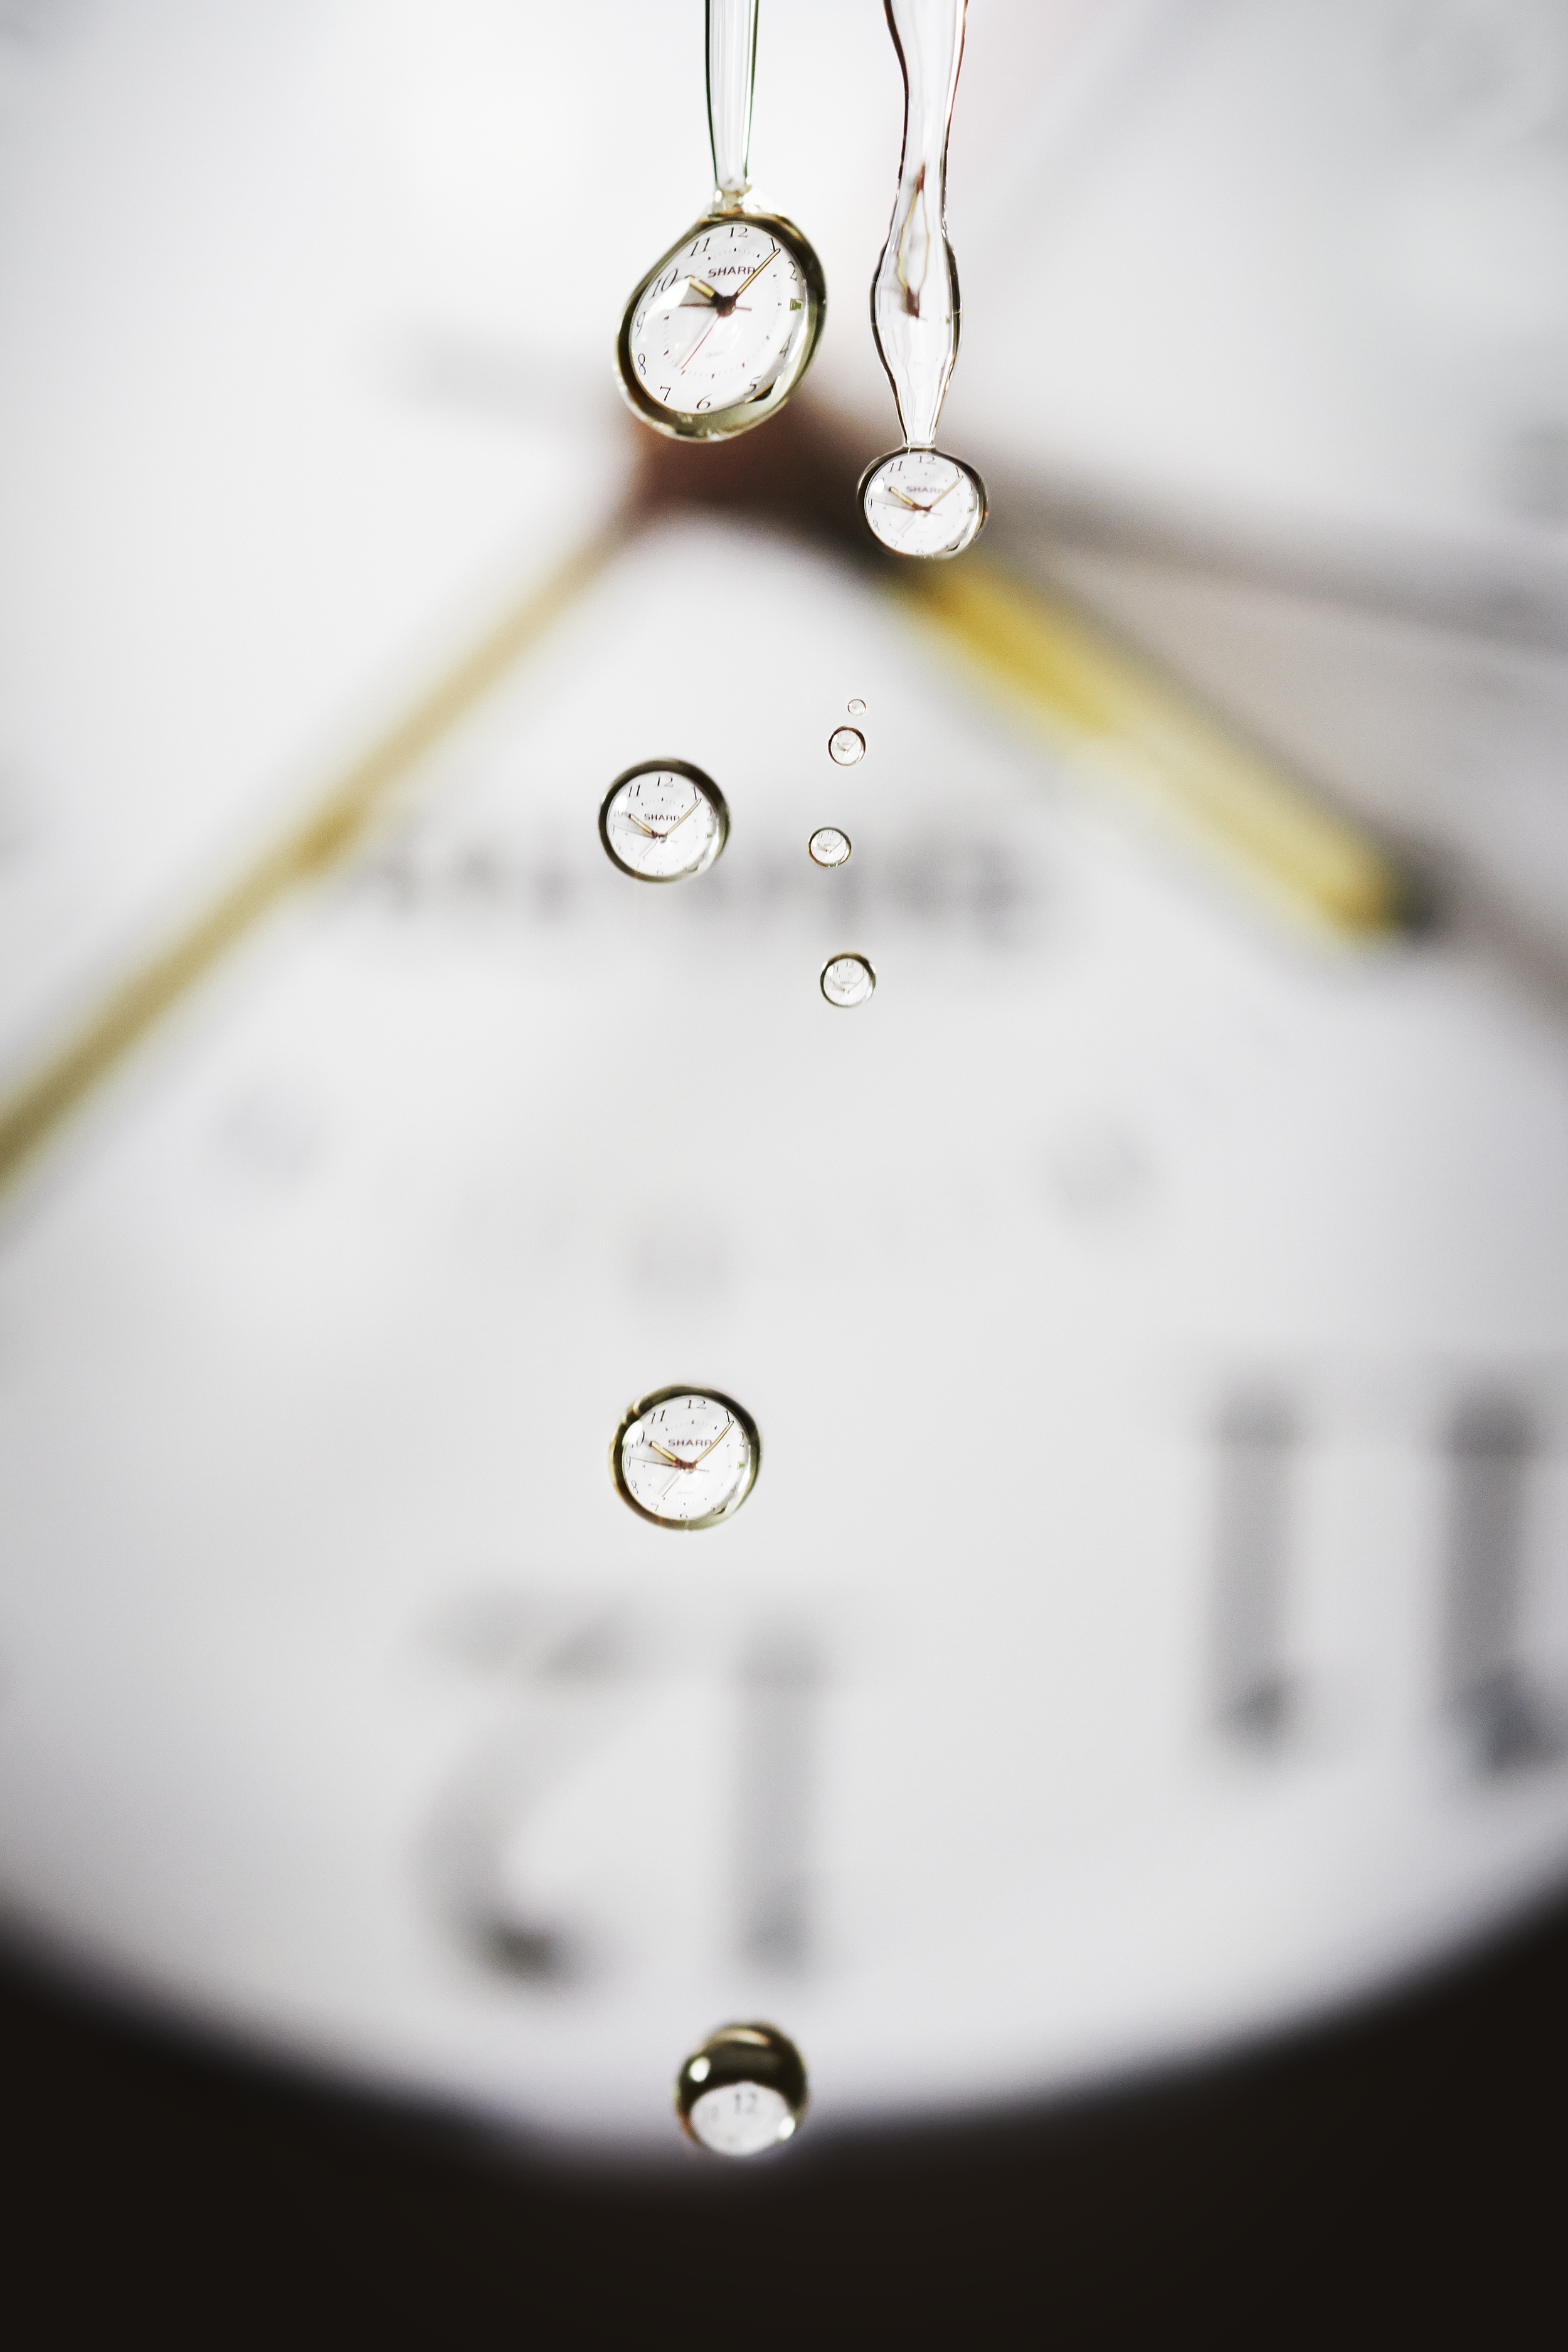 clockdrip2.jpg